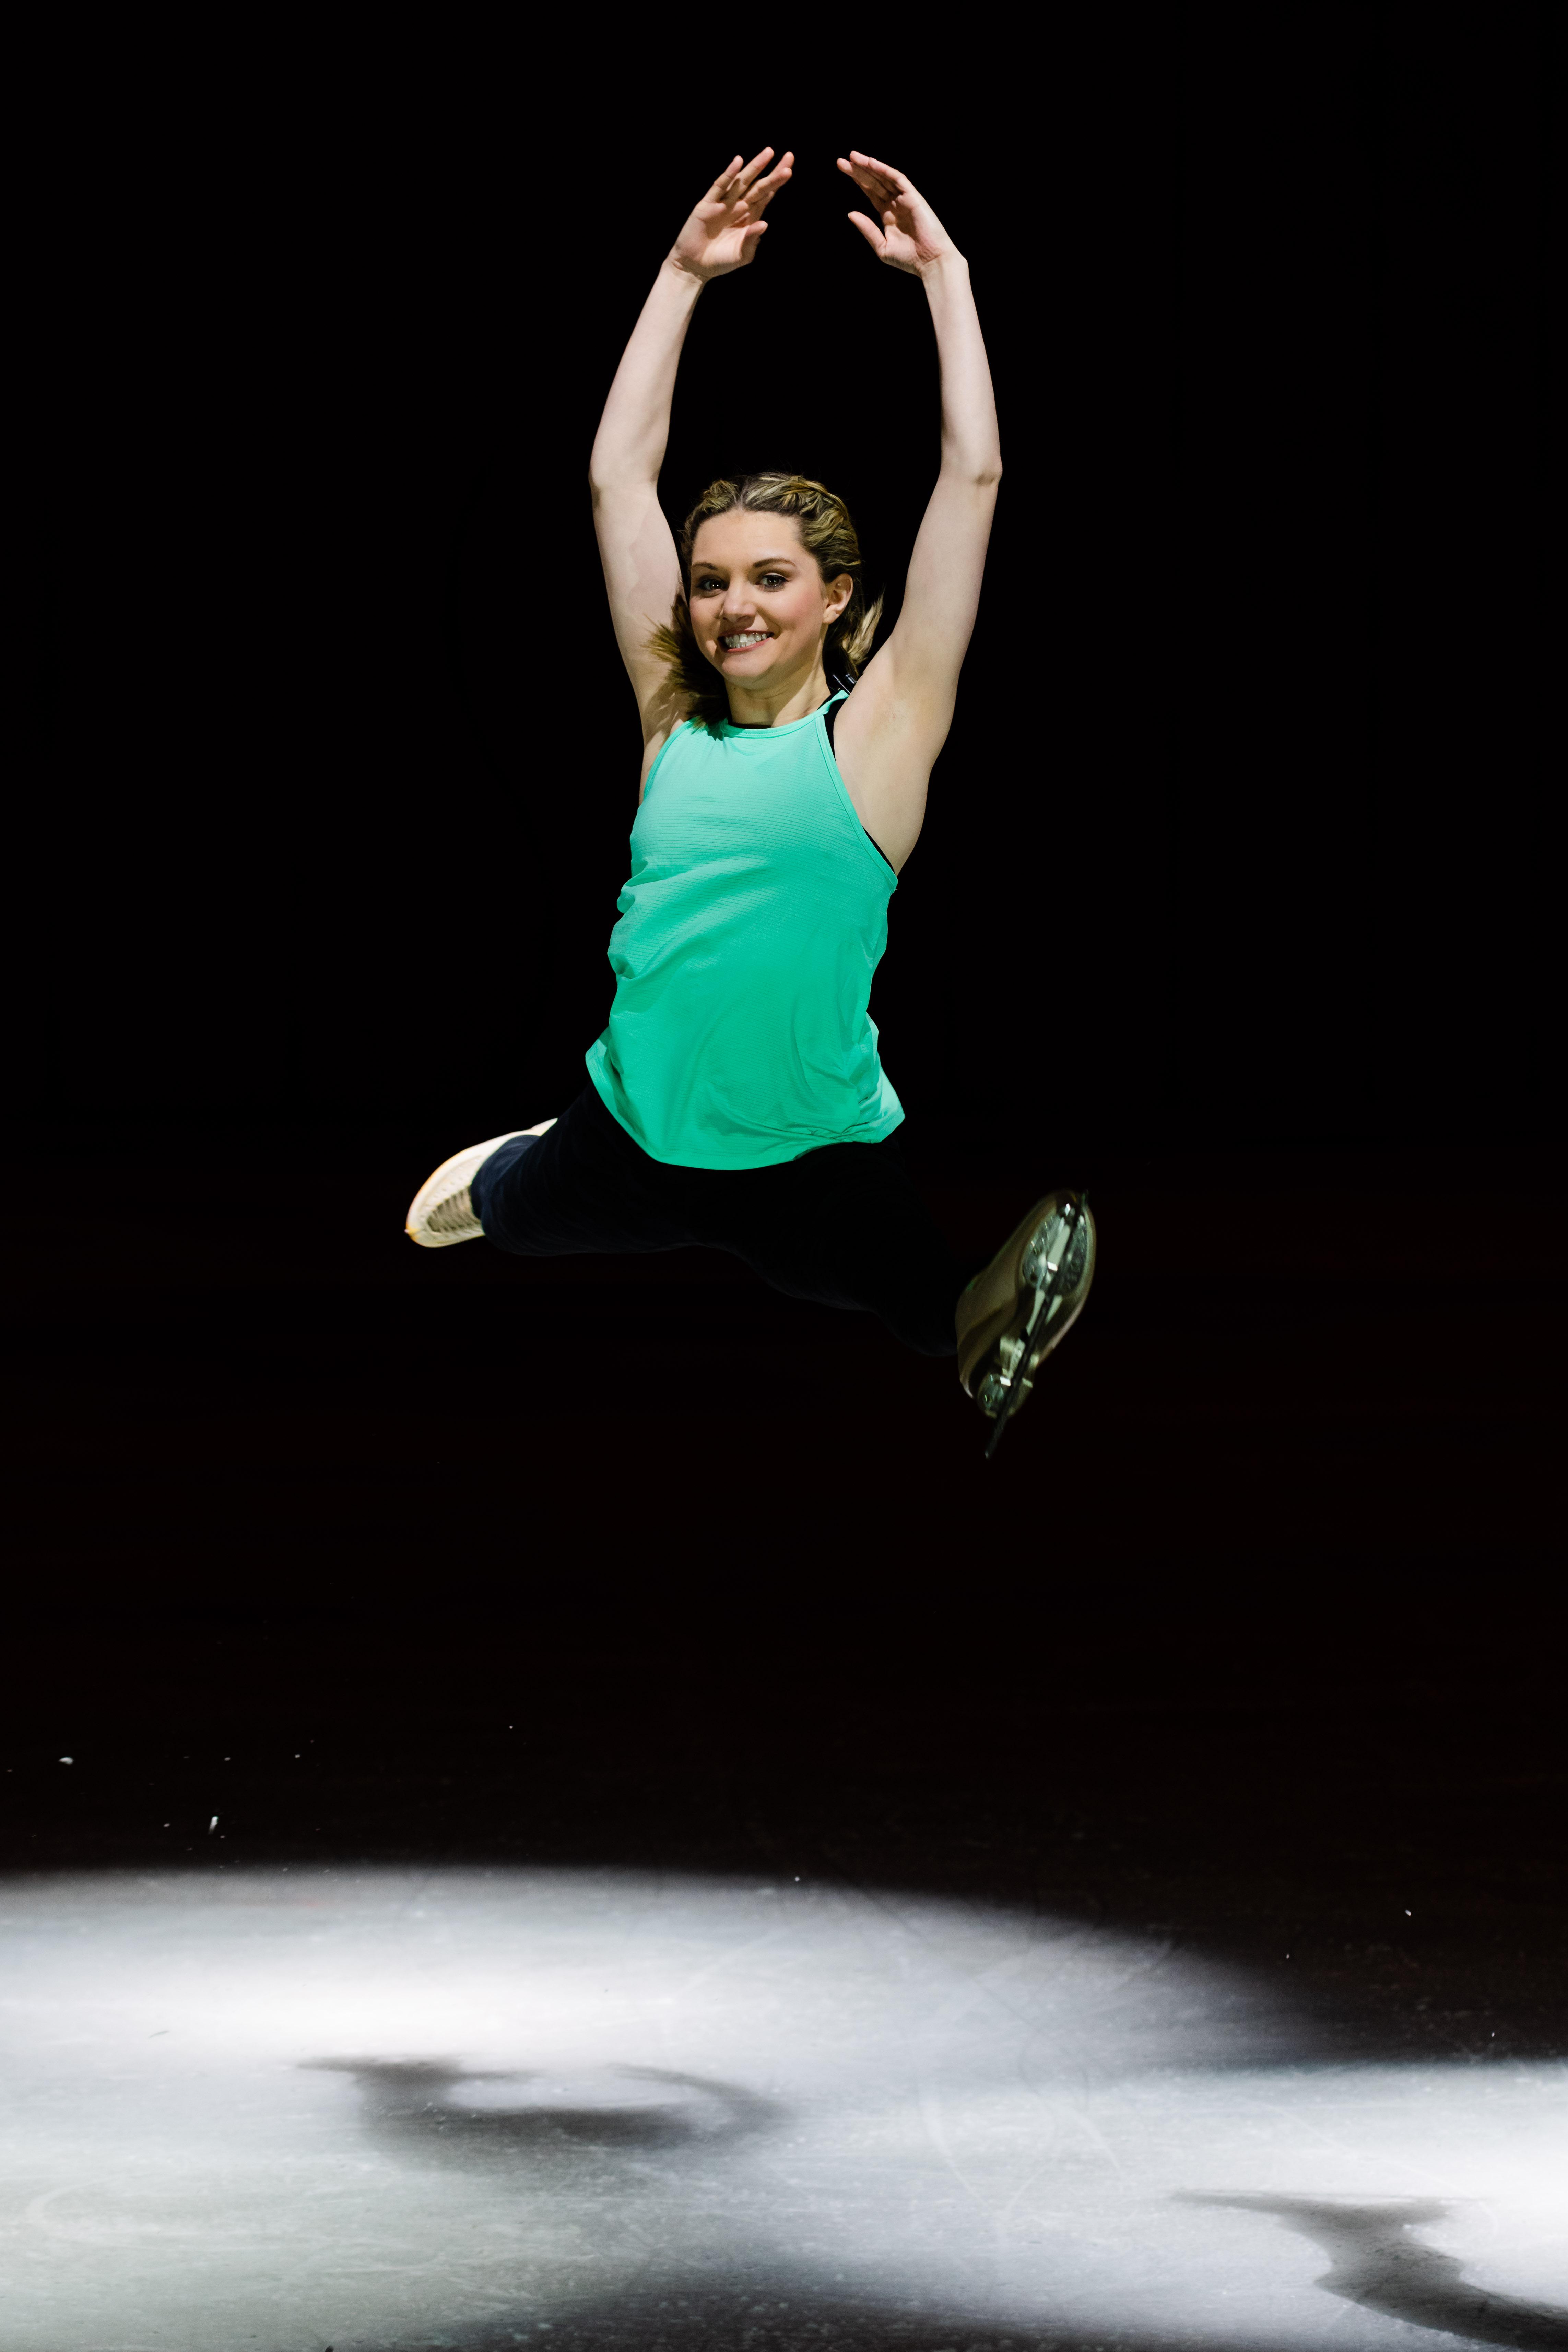 Lexi Split Jump